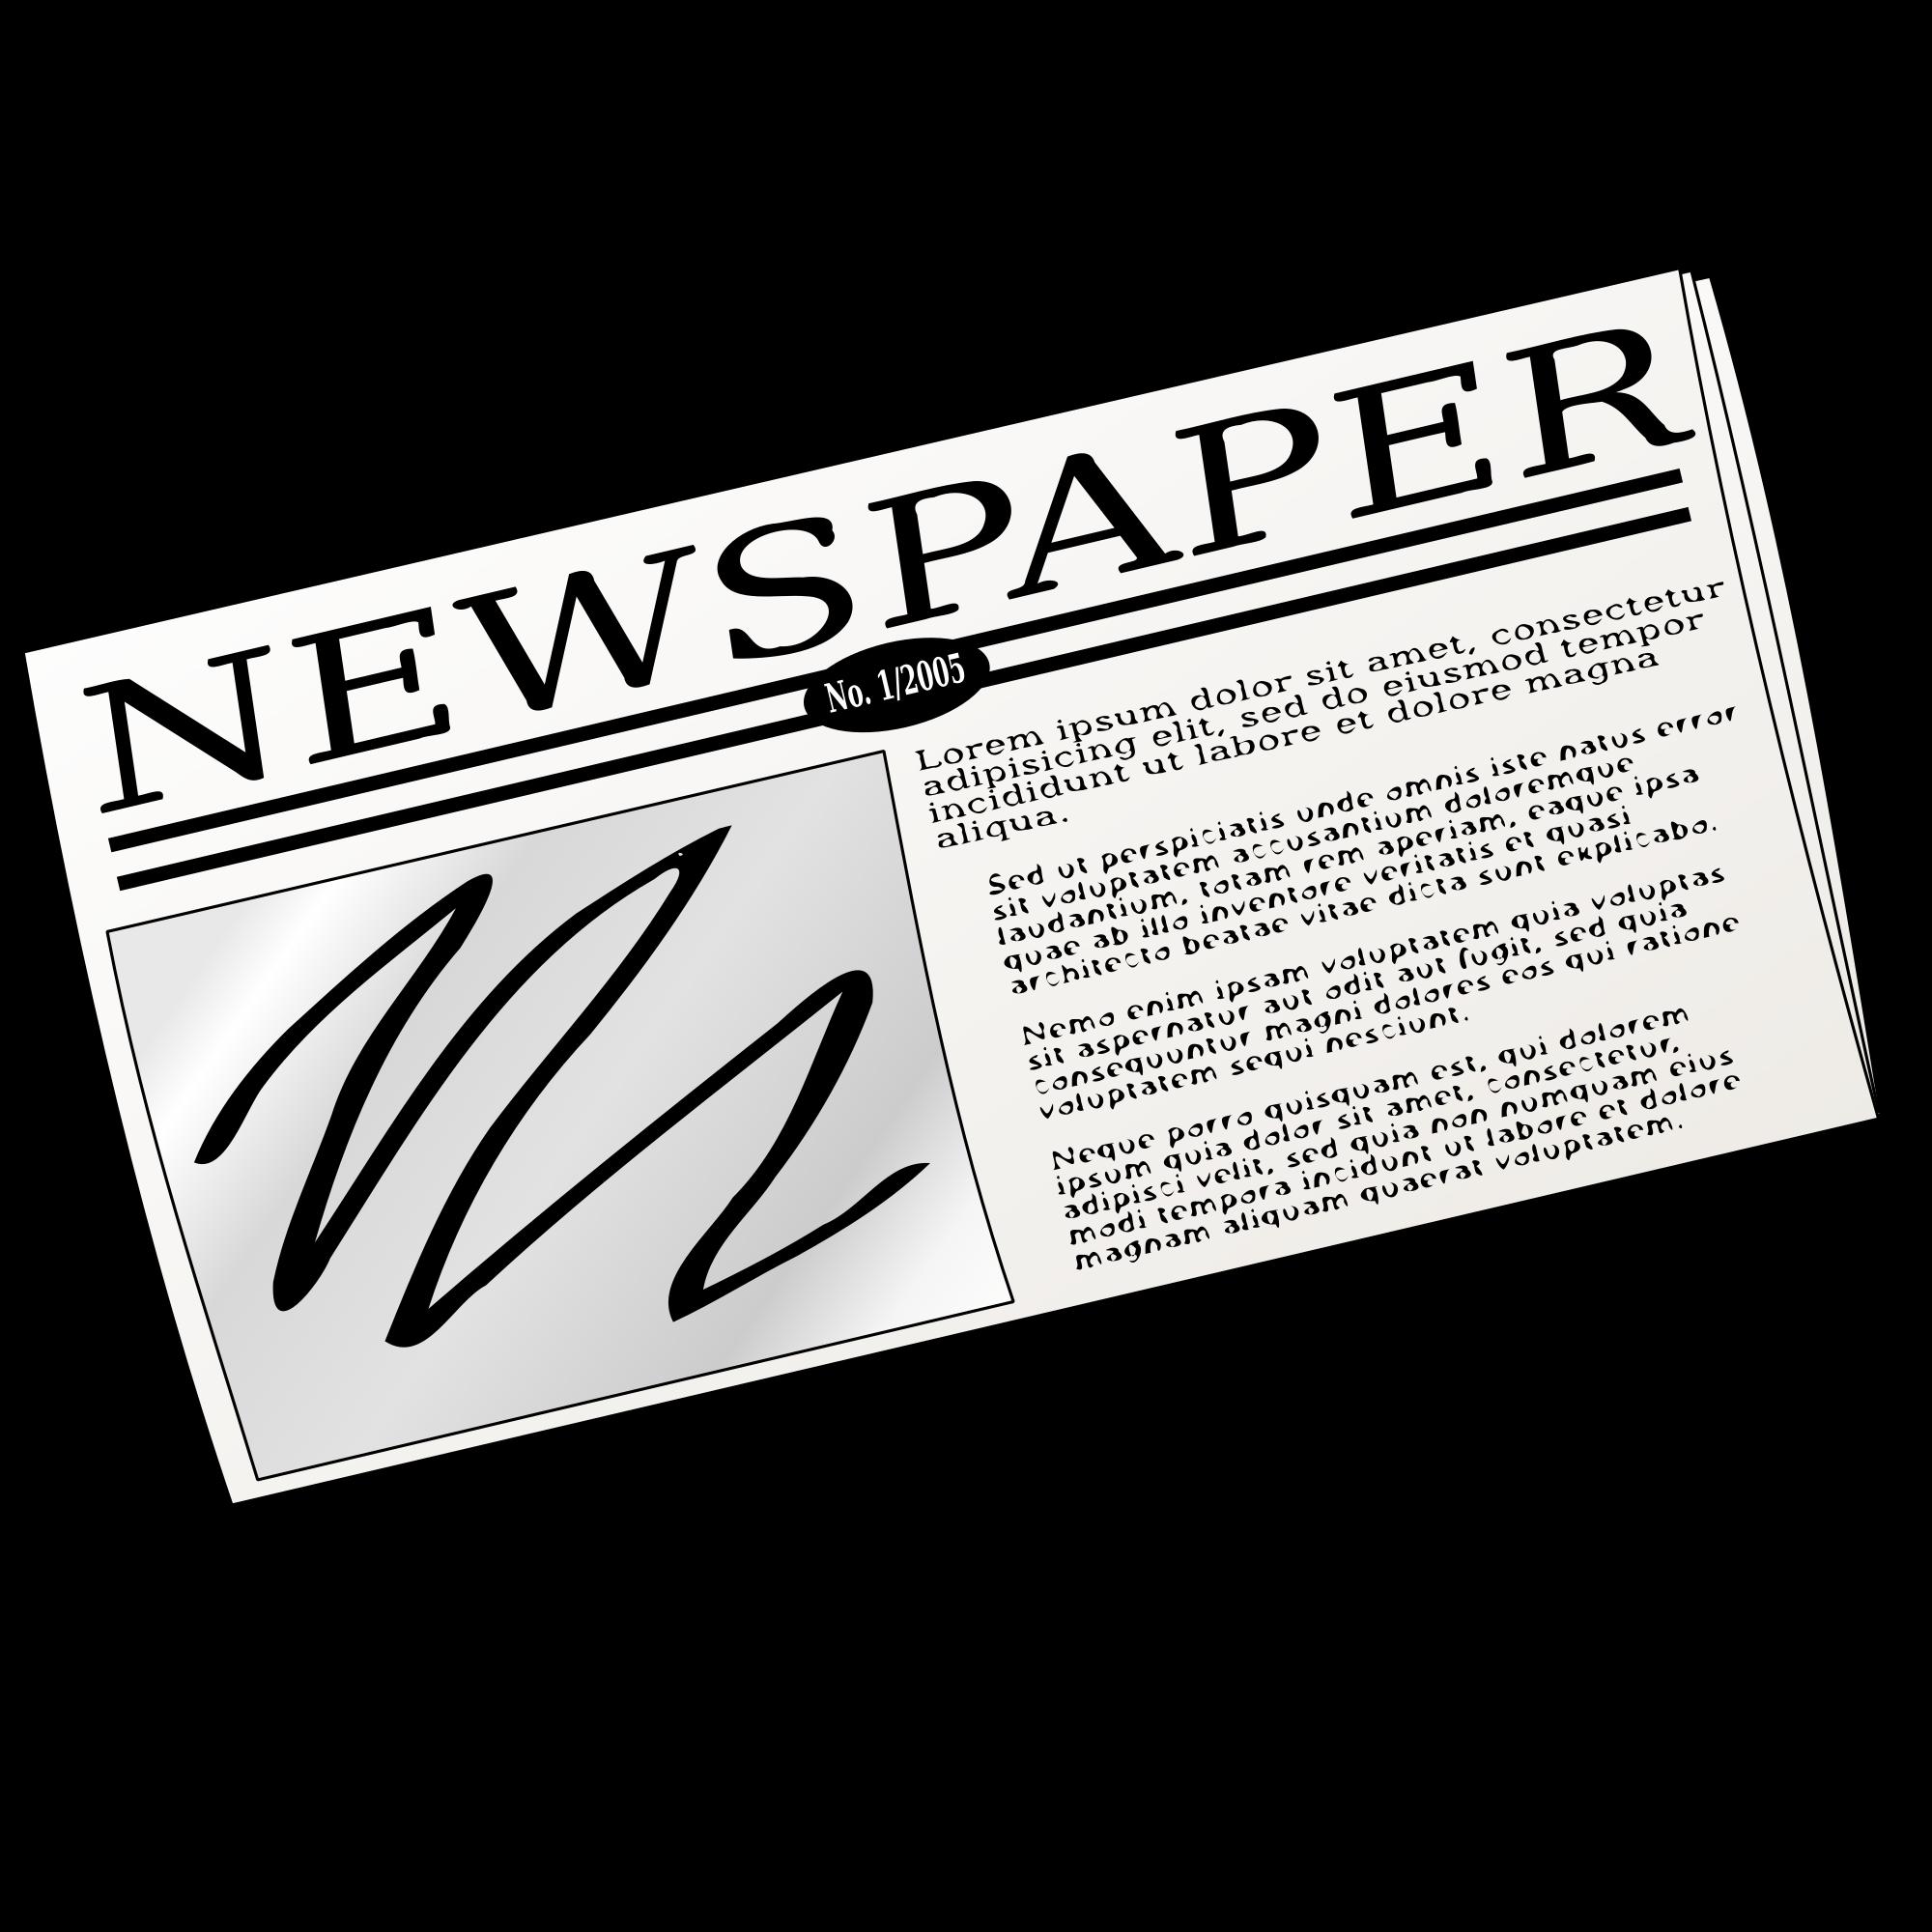 Drawing at getdrawings com. News clipart newspaper vendor